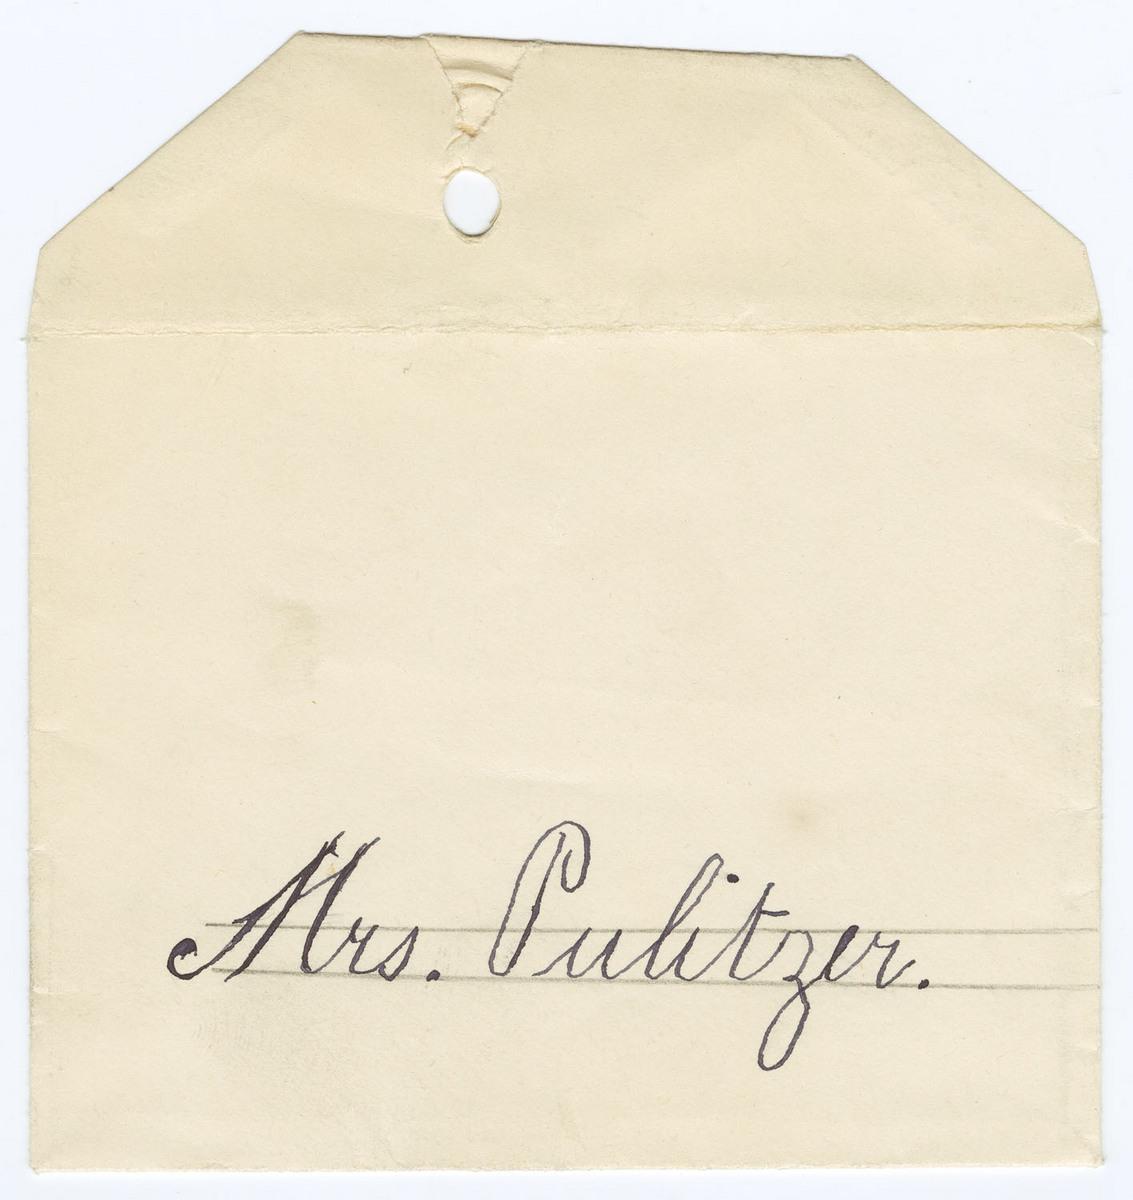 Envelope addressed to Mrs. Pultizer